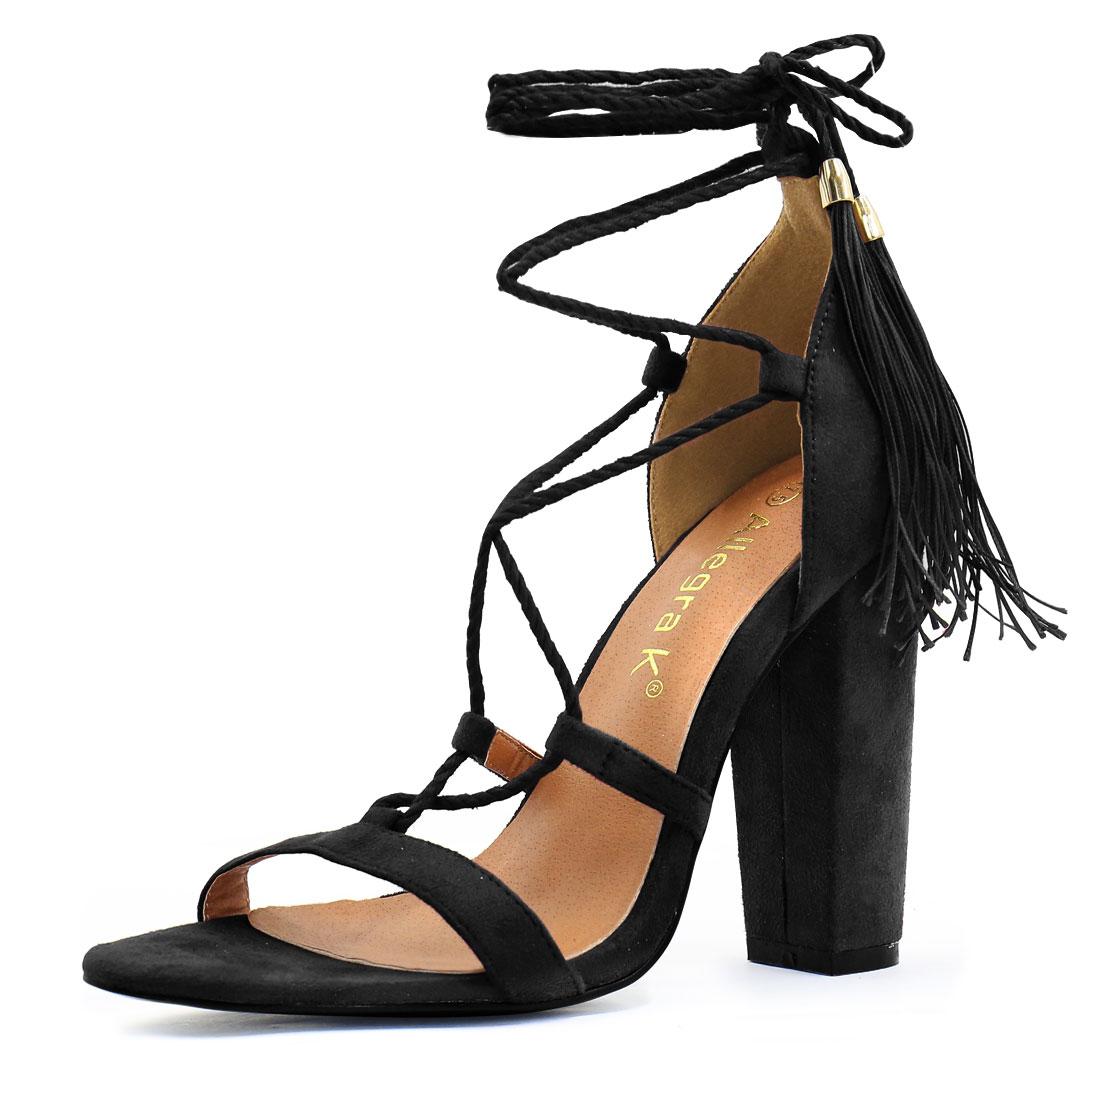 Women Chunky High Heel Tassel Closure Lace Up Sandals Black US 7.5